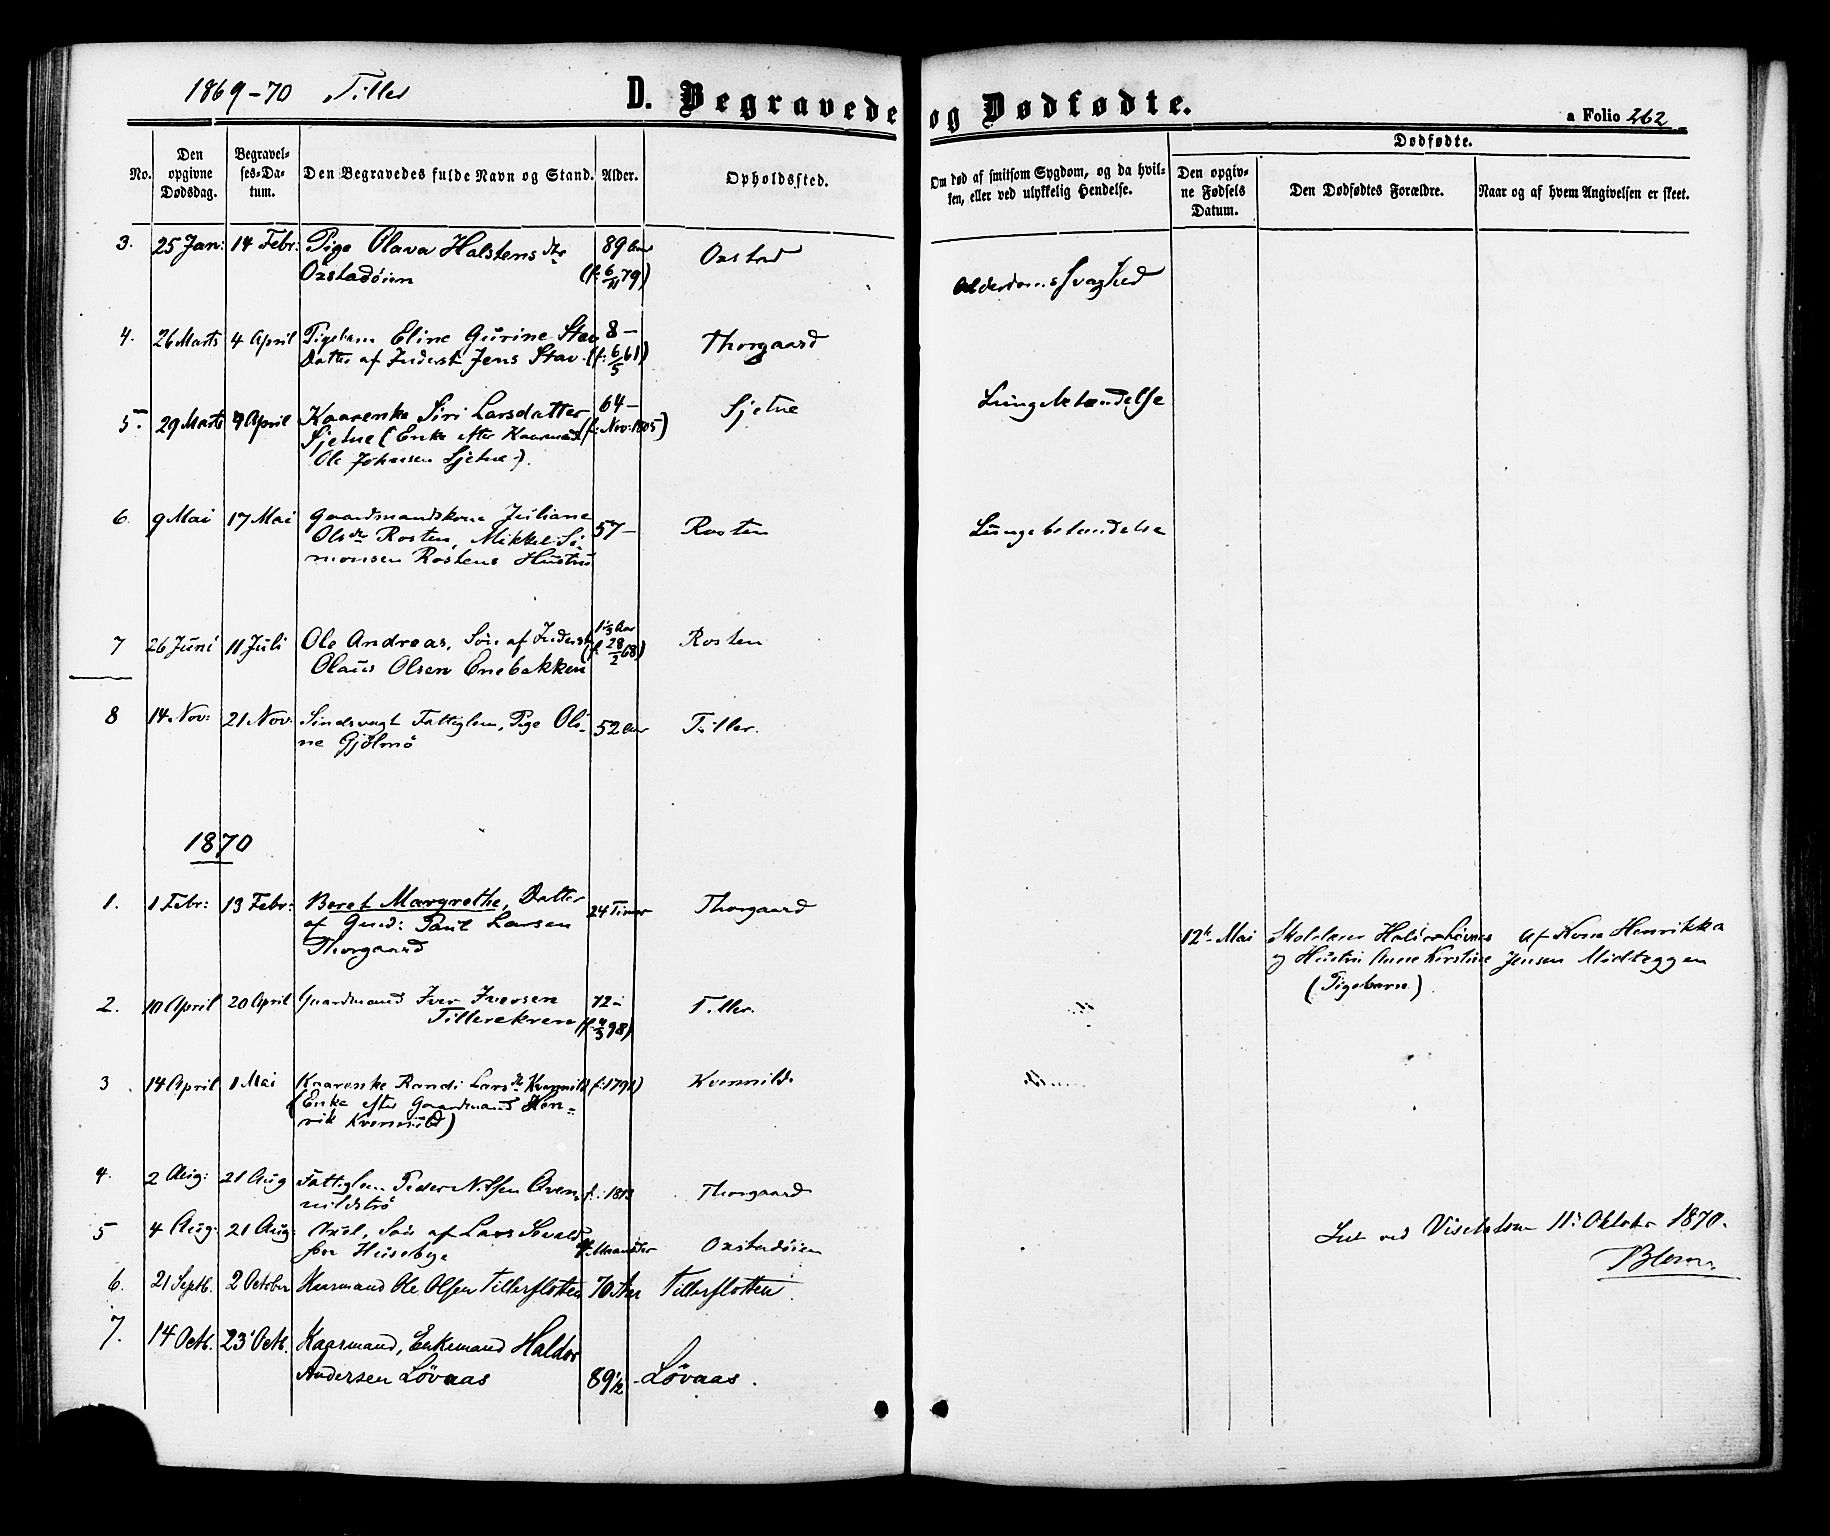 SAT, Ministerialprotokoller, klokkerbøker og fødselsregistre - Sør-Trøndelag, 618/L0443: Parish register (official) no. 618A06 /2, 1863-1879, p. 262